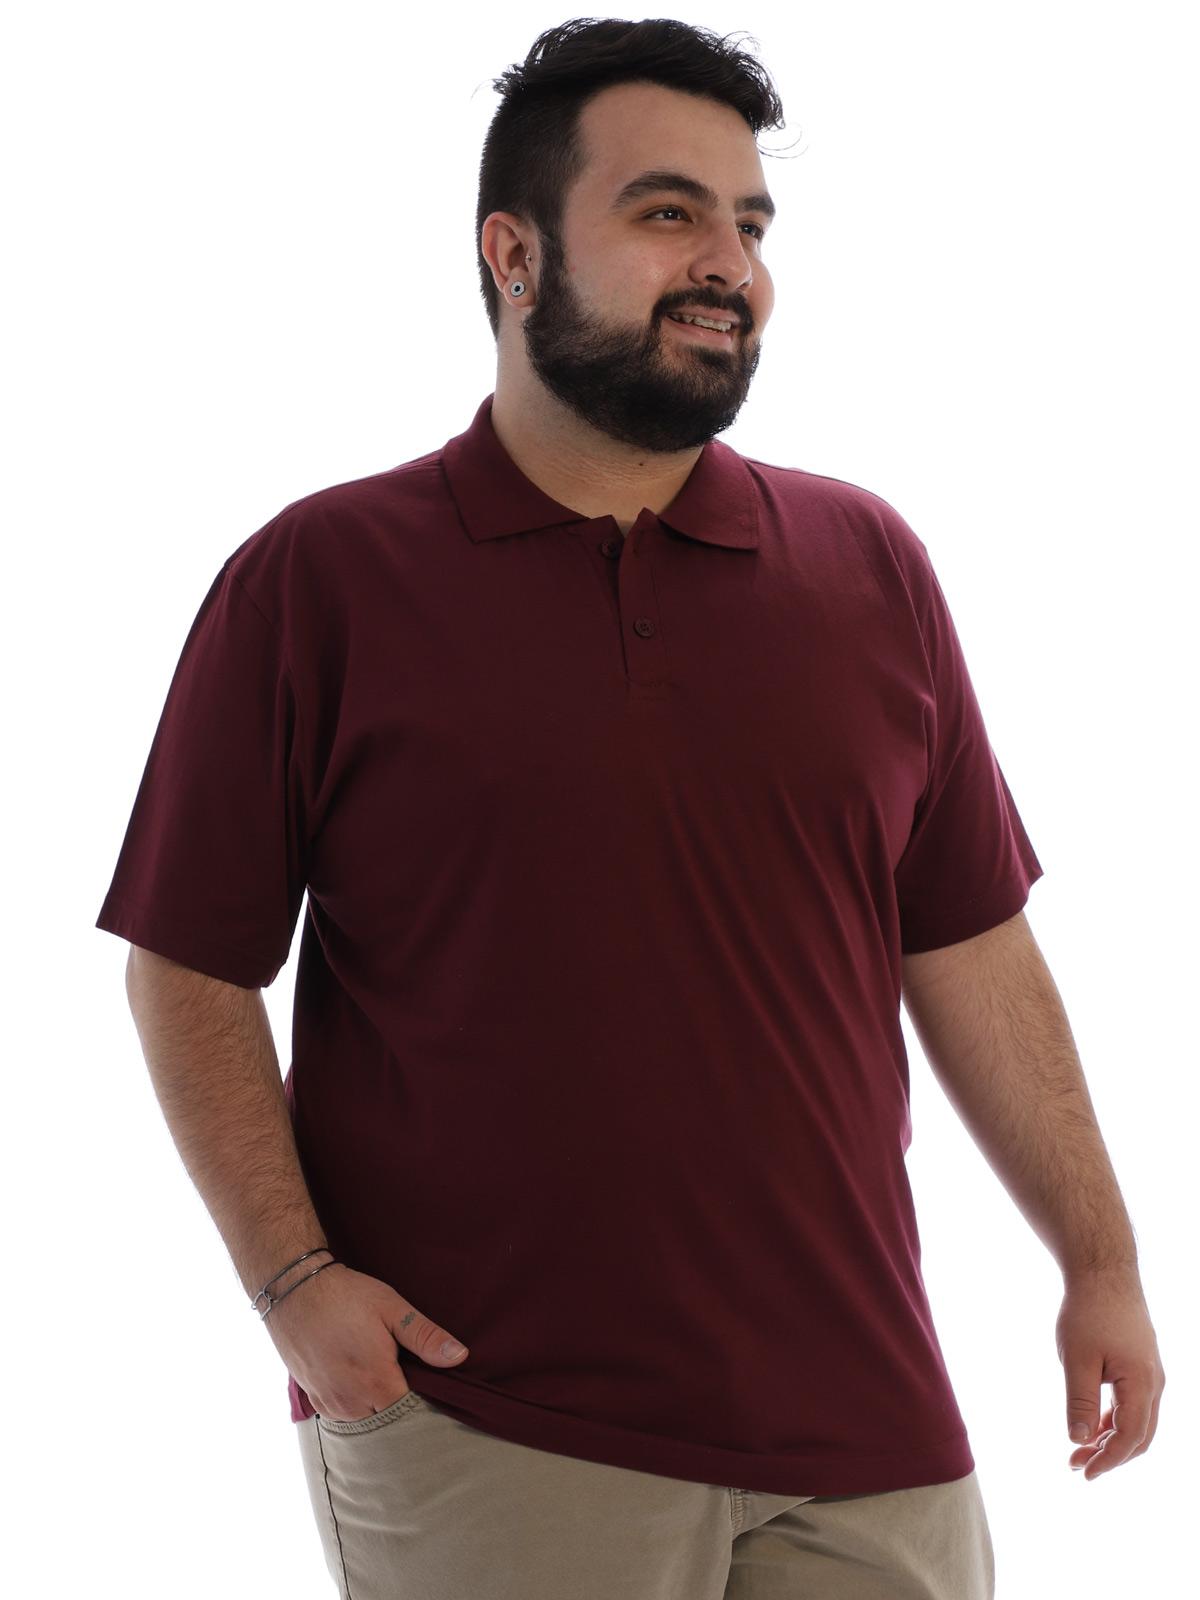 Camisa Polo Plus Size Masculina Lisa Básica Algodão Vinho